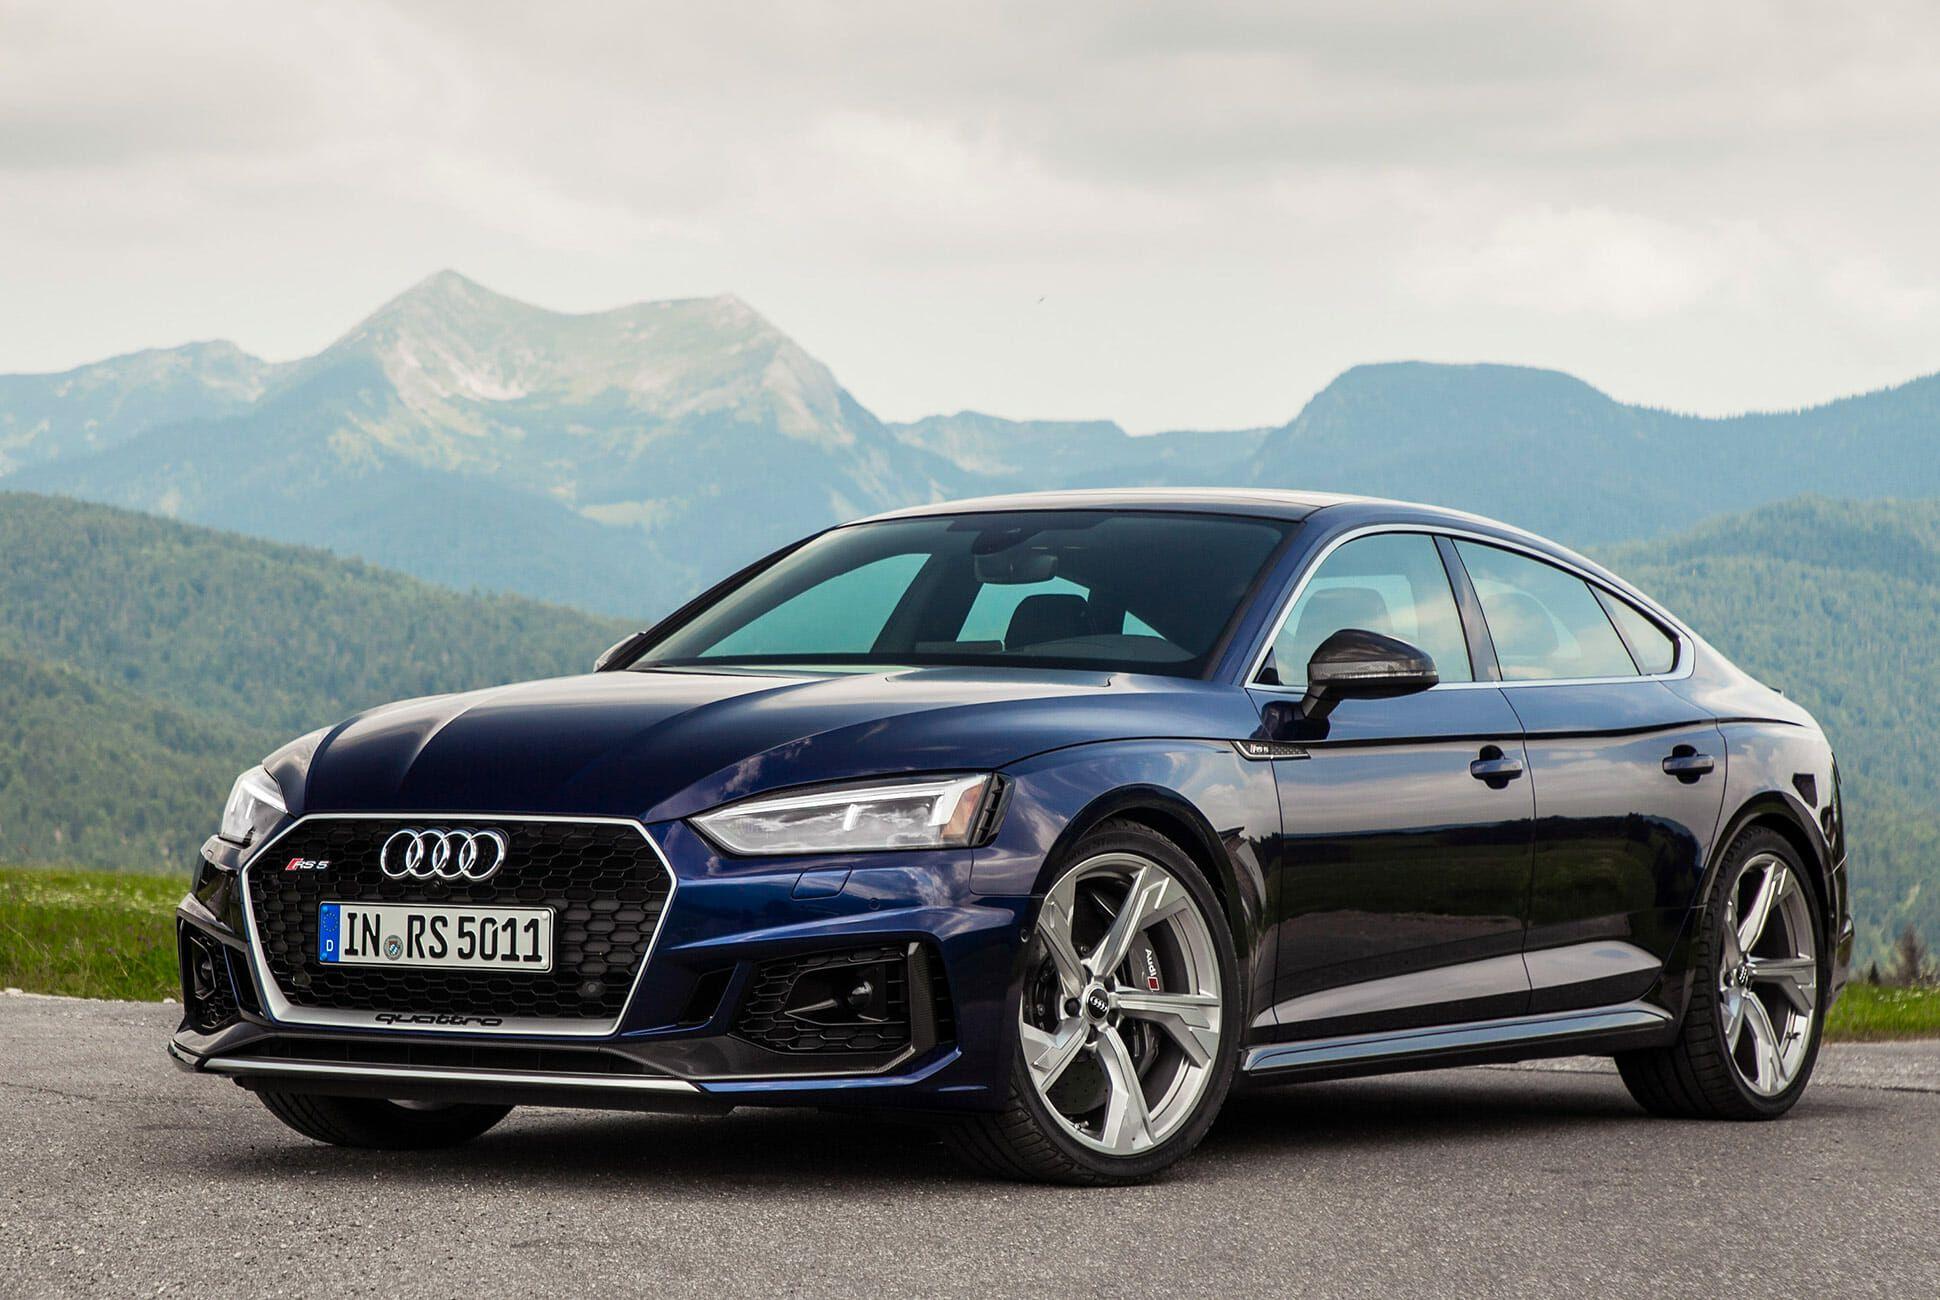 Audi-RS5-Sportback-Review-gear-patrol-slide-1